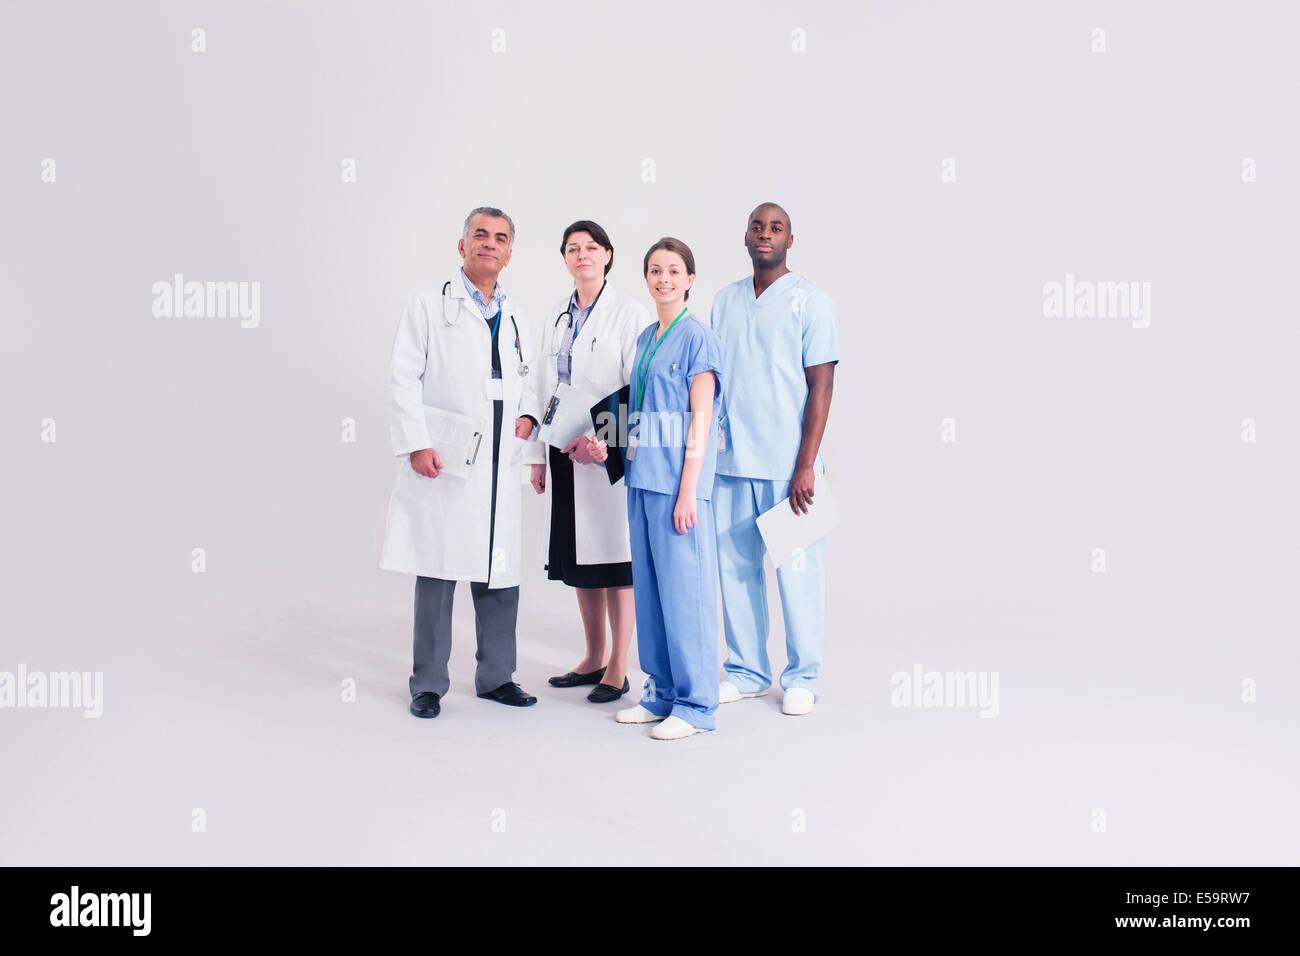 Portrait of confident doctors and nurses - Stock Image